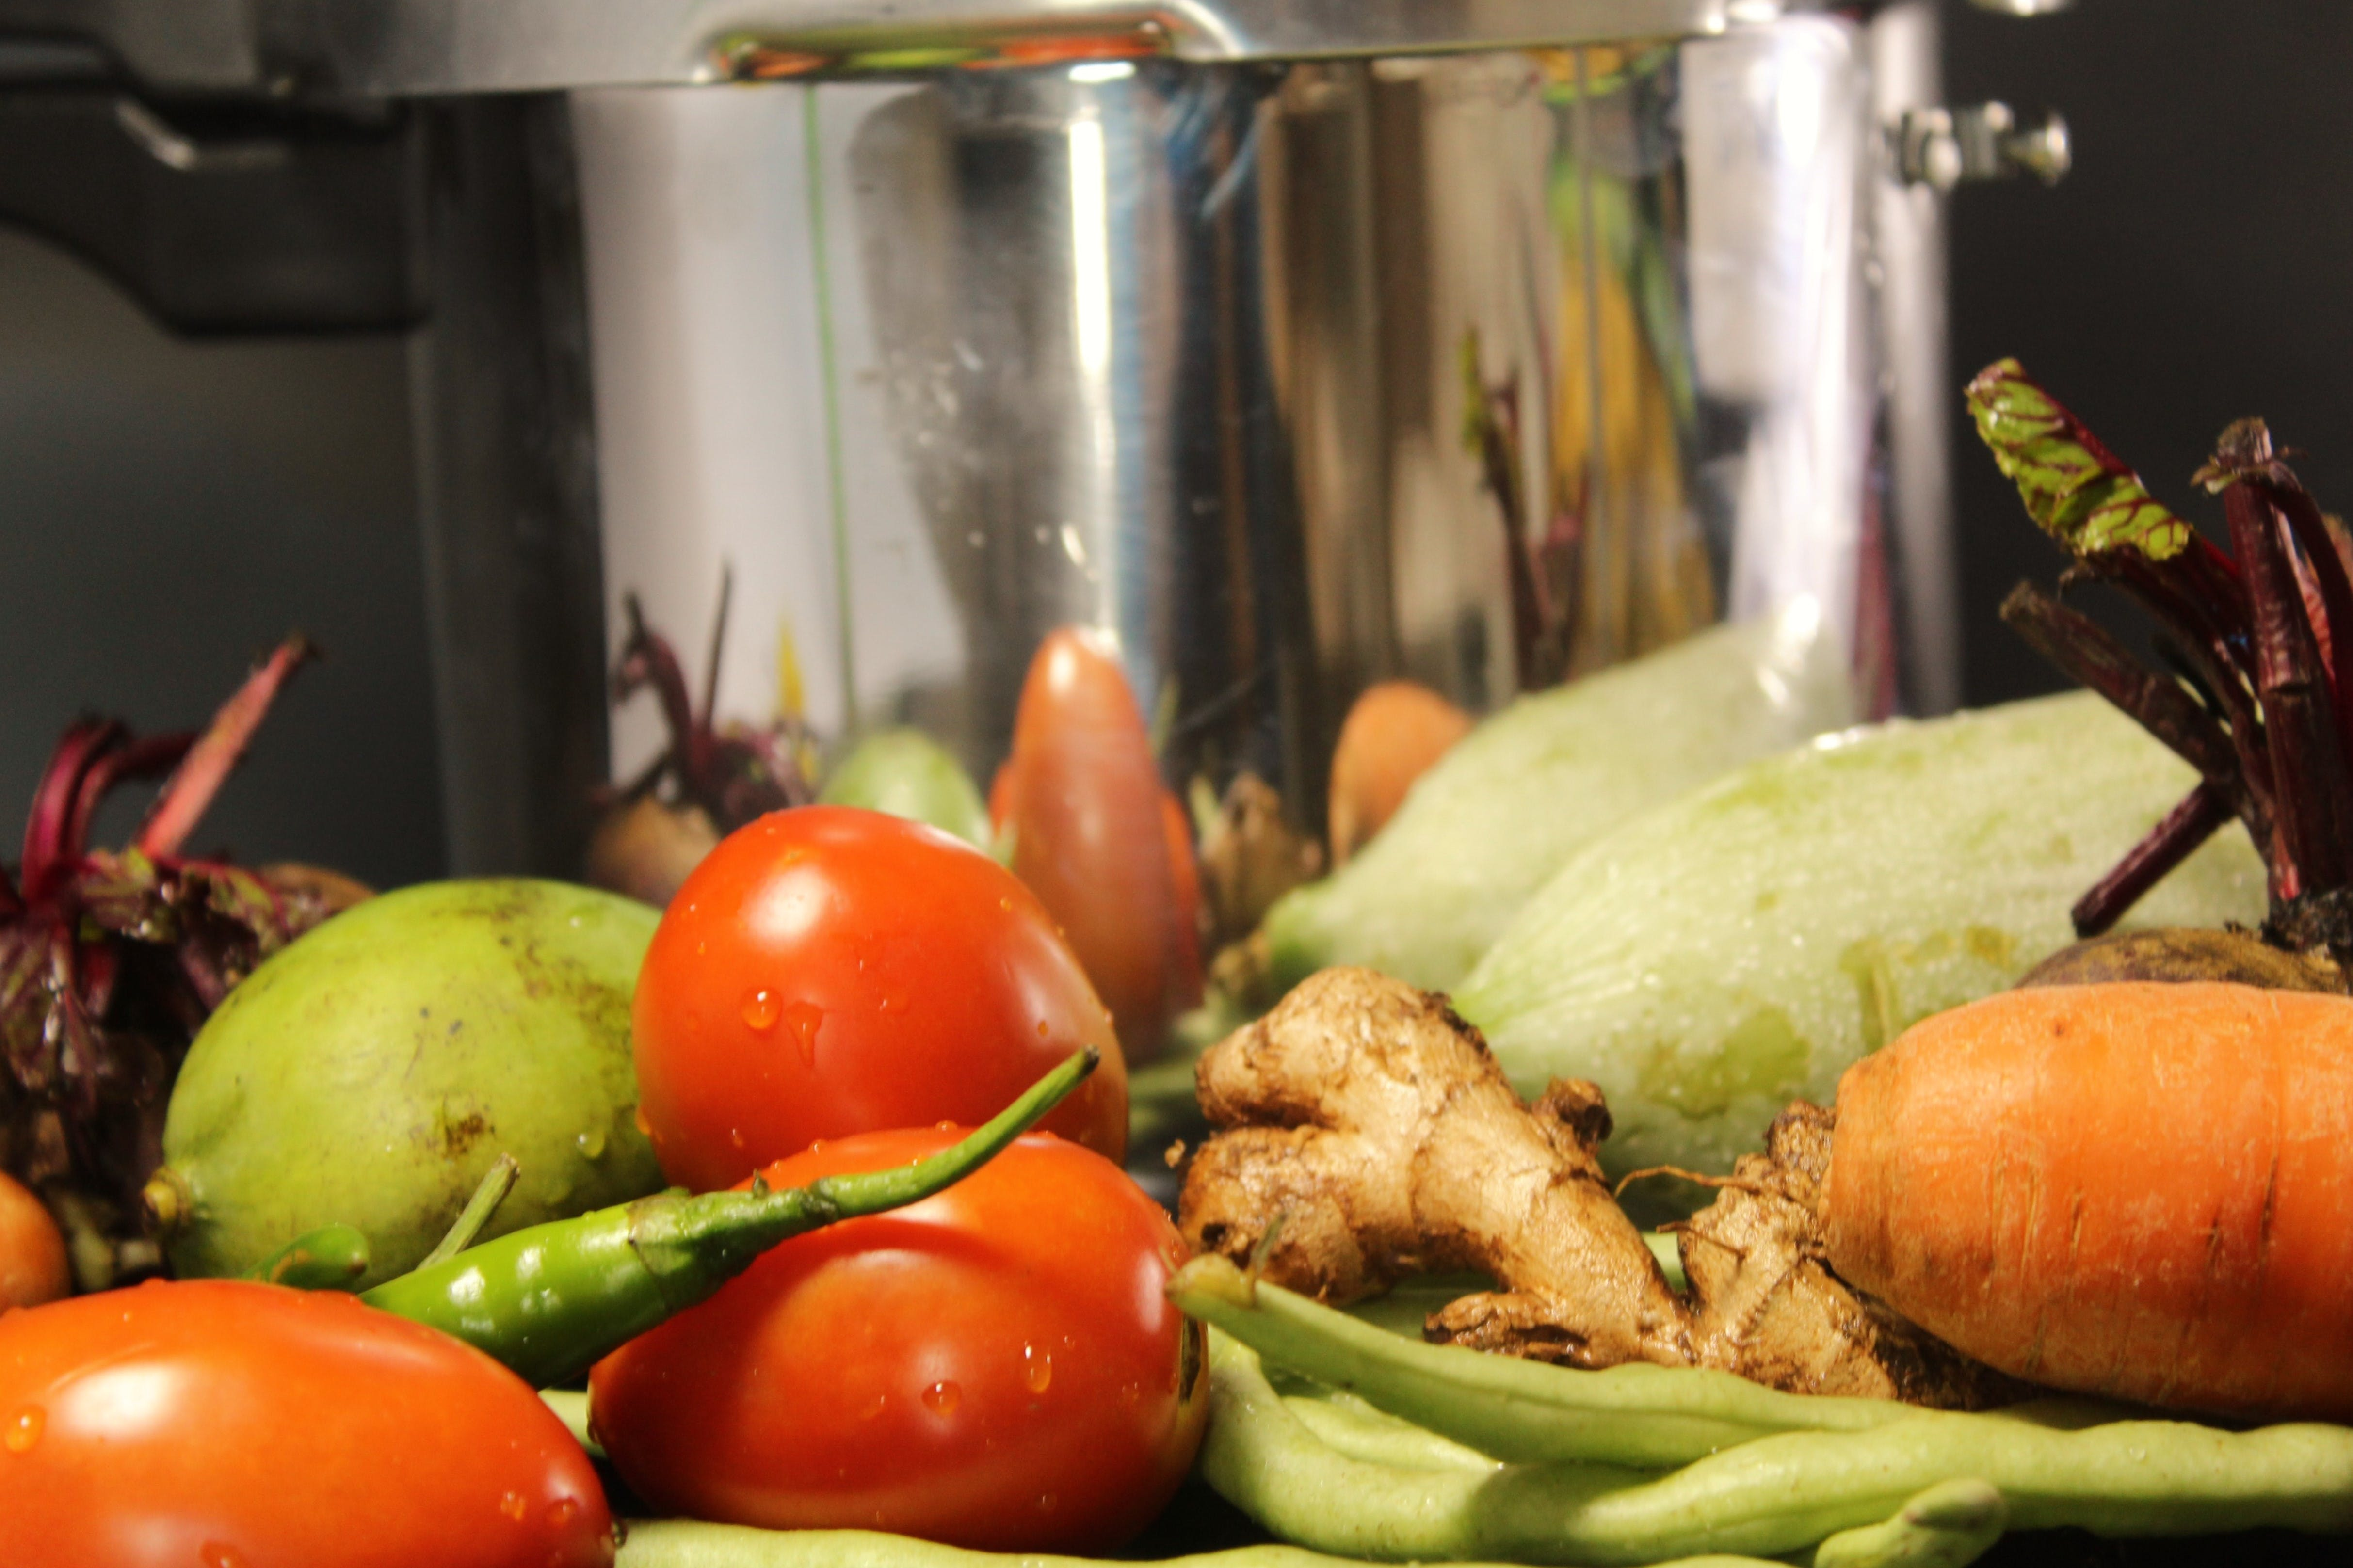 Free stock photo of carrots, chilli, cooker, fresh vegetables